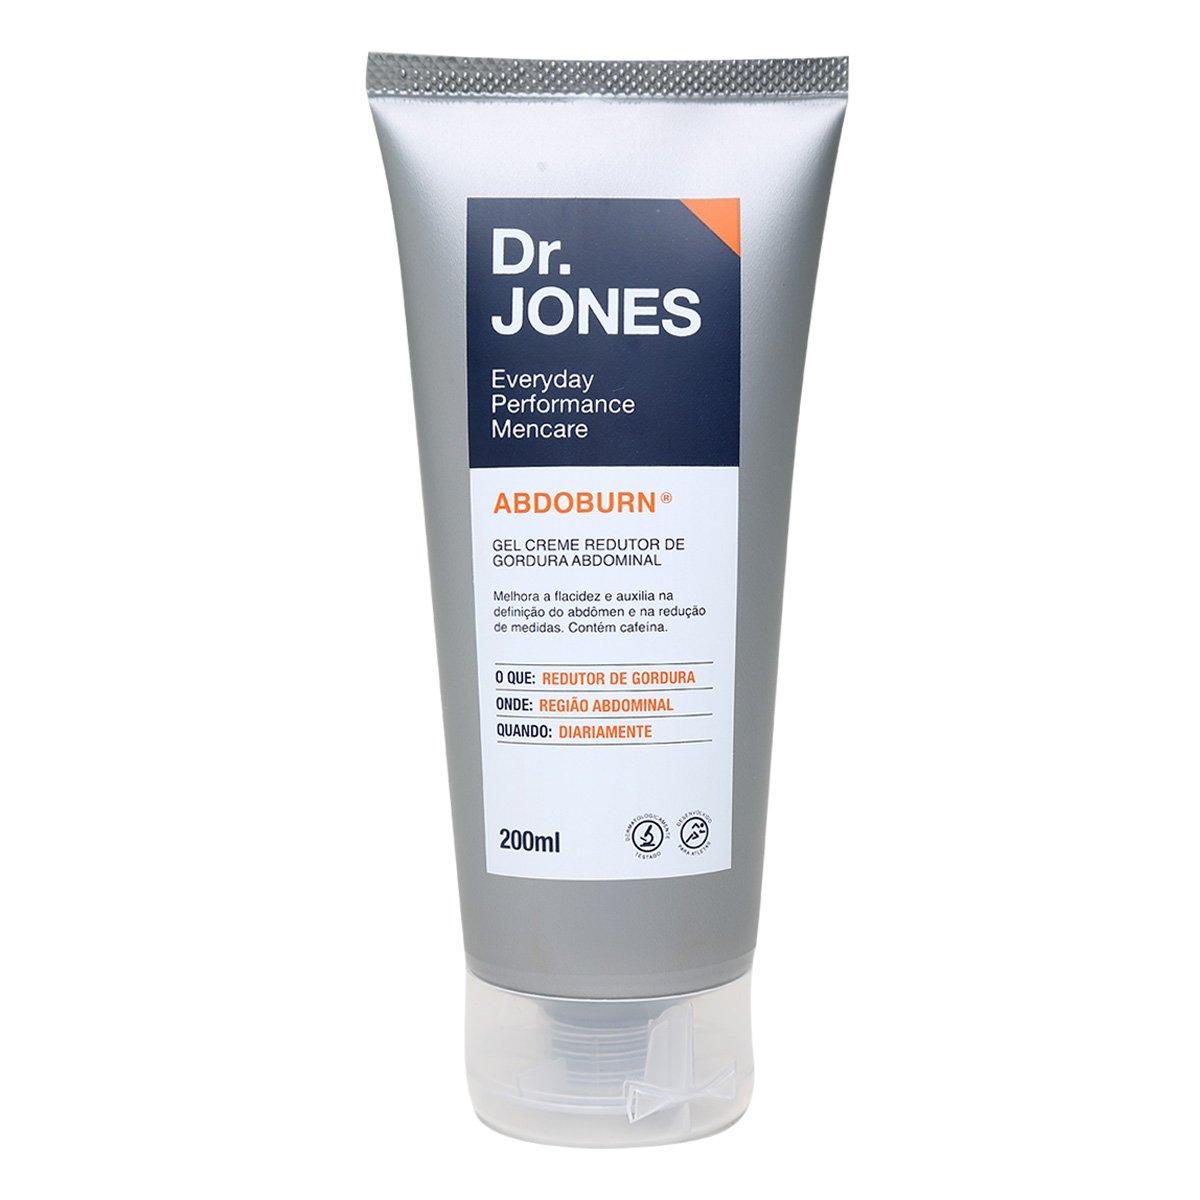 Gel Creme Redutor de Gordura Dr. Jones Abdoburn 200ml